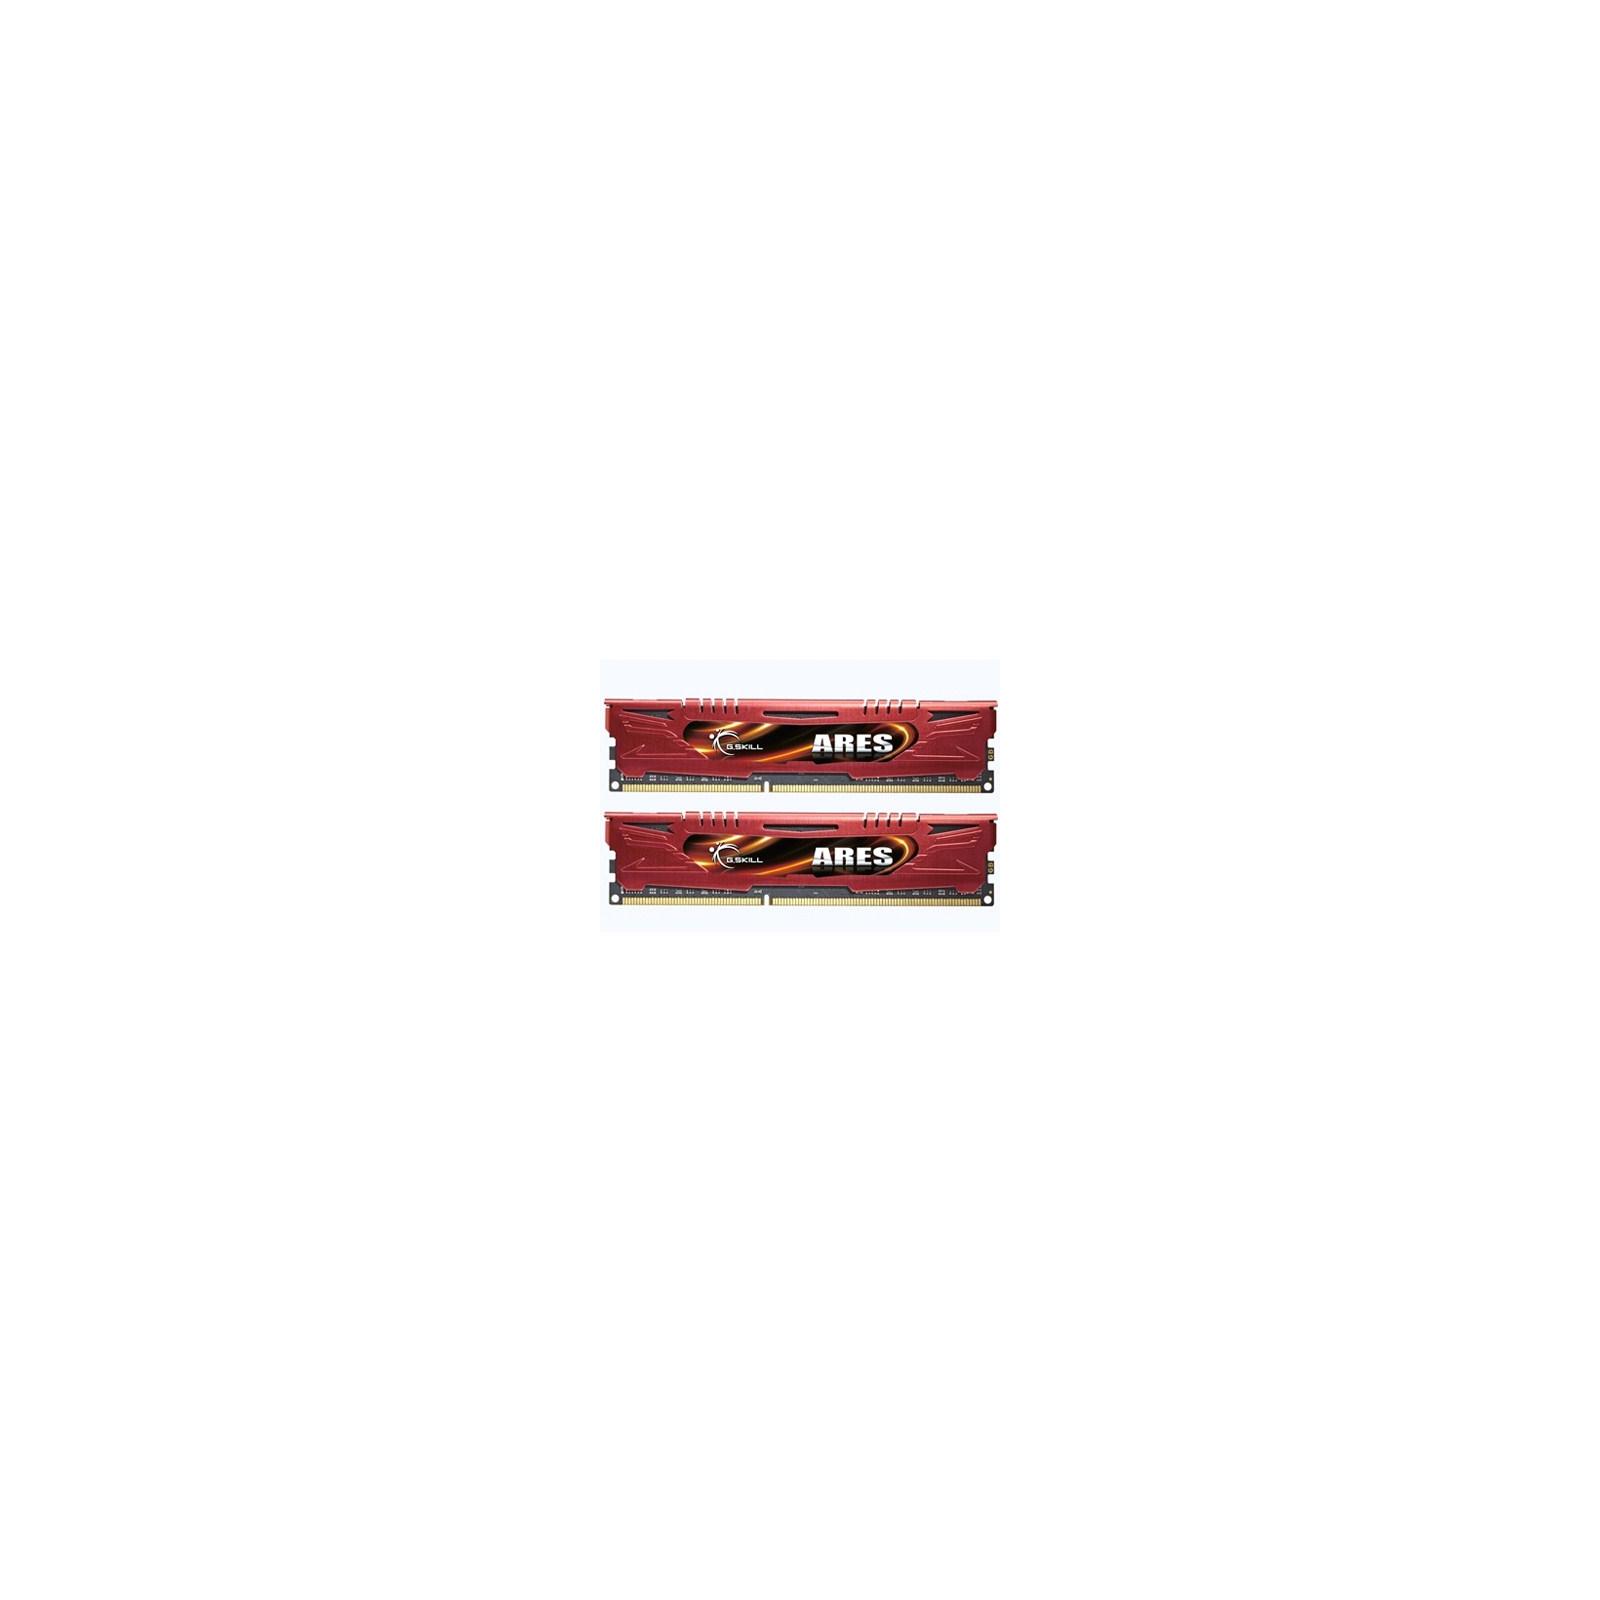 Модуль памяти для компьютера DDR3 16GB (2x8GB) 1600 MHz G.Skill (F3-1600C9D-16GAR)